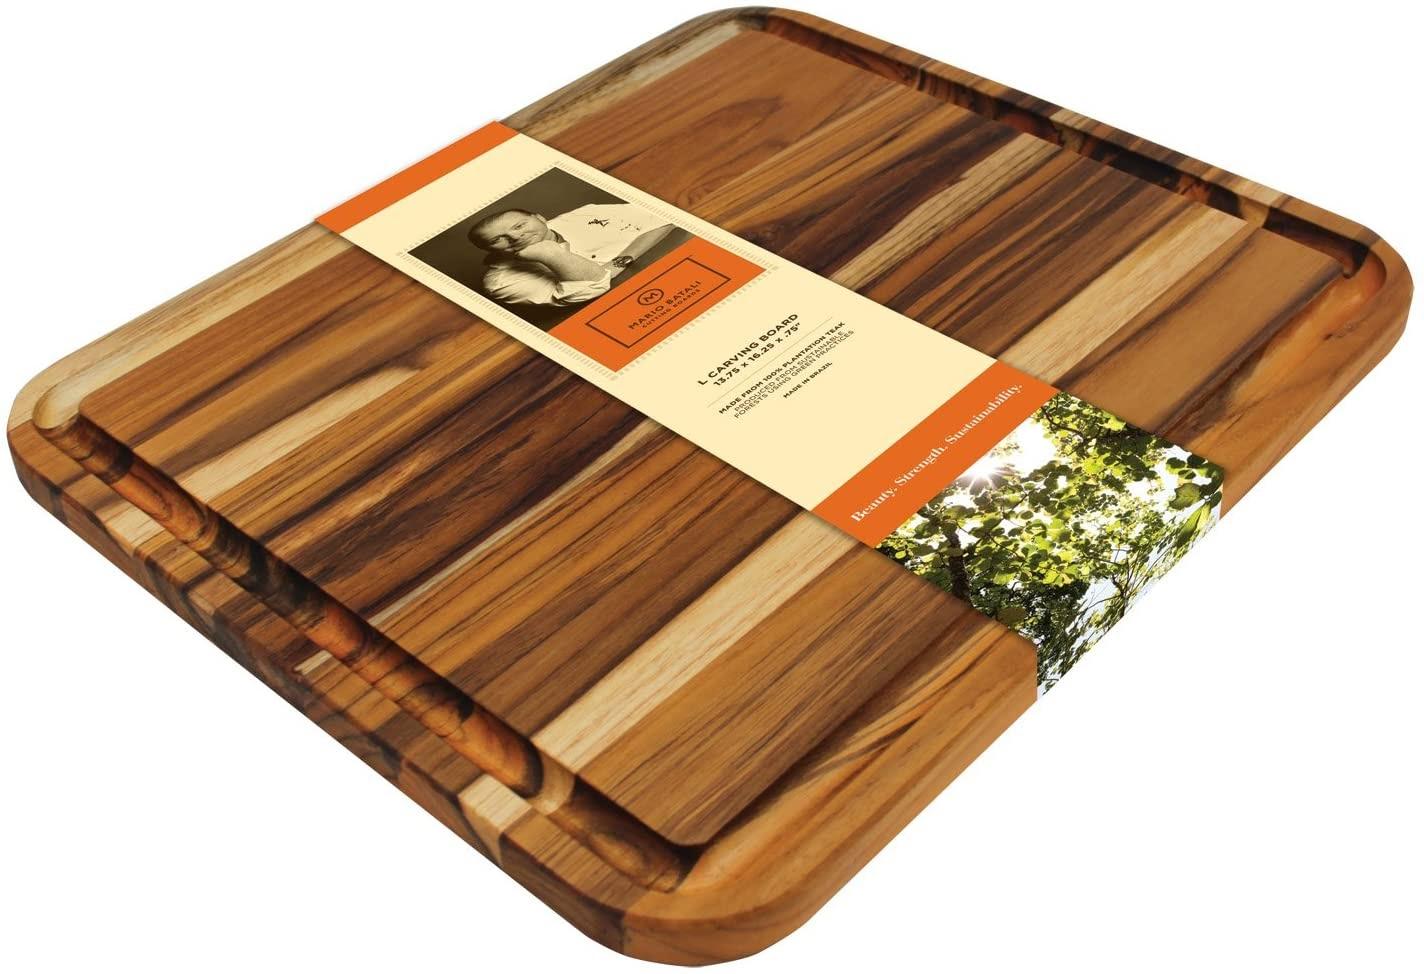 Madeira Mario Batali M-04 Edge Grain Teak Carving Board